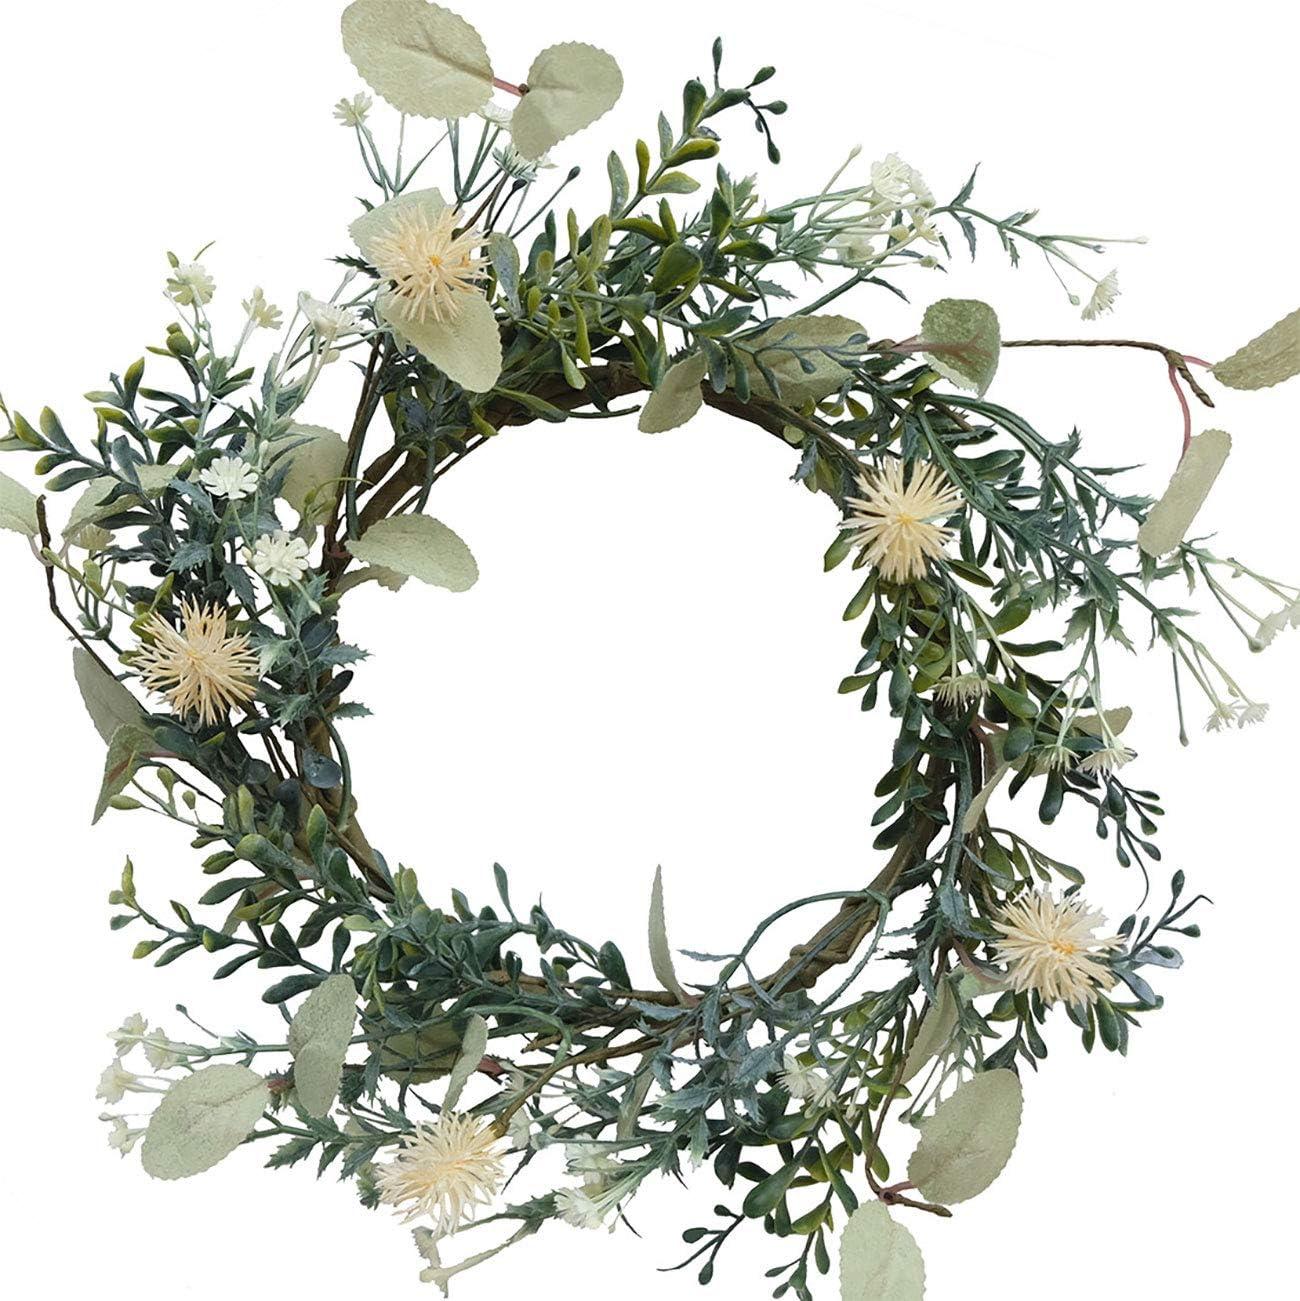 Bibelot Artificial Baby's Breath Flower Wreath Green Leaves Wreath Summer Wreath Farmhouse Decor for Front Door Wedding Wall Home Decor (14in)